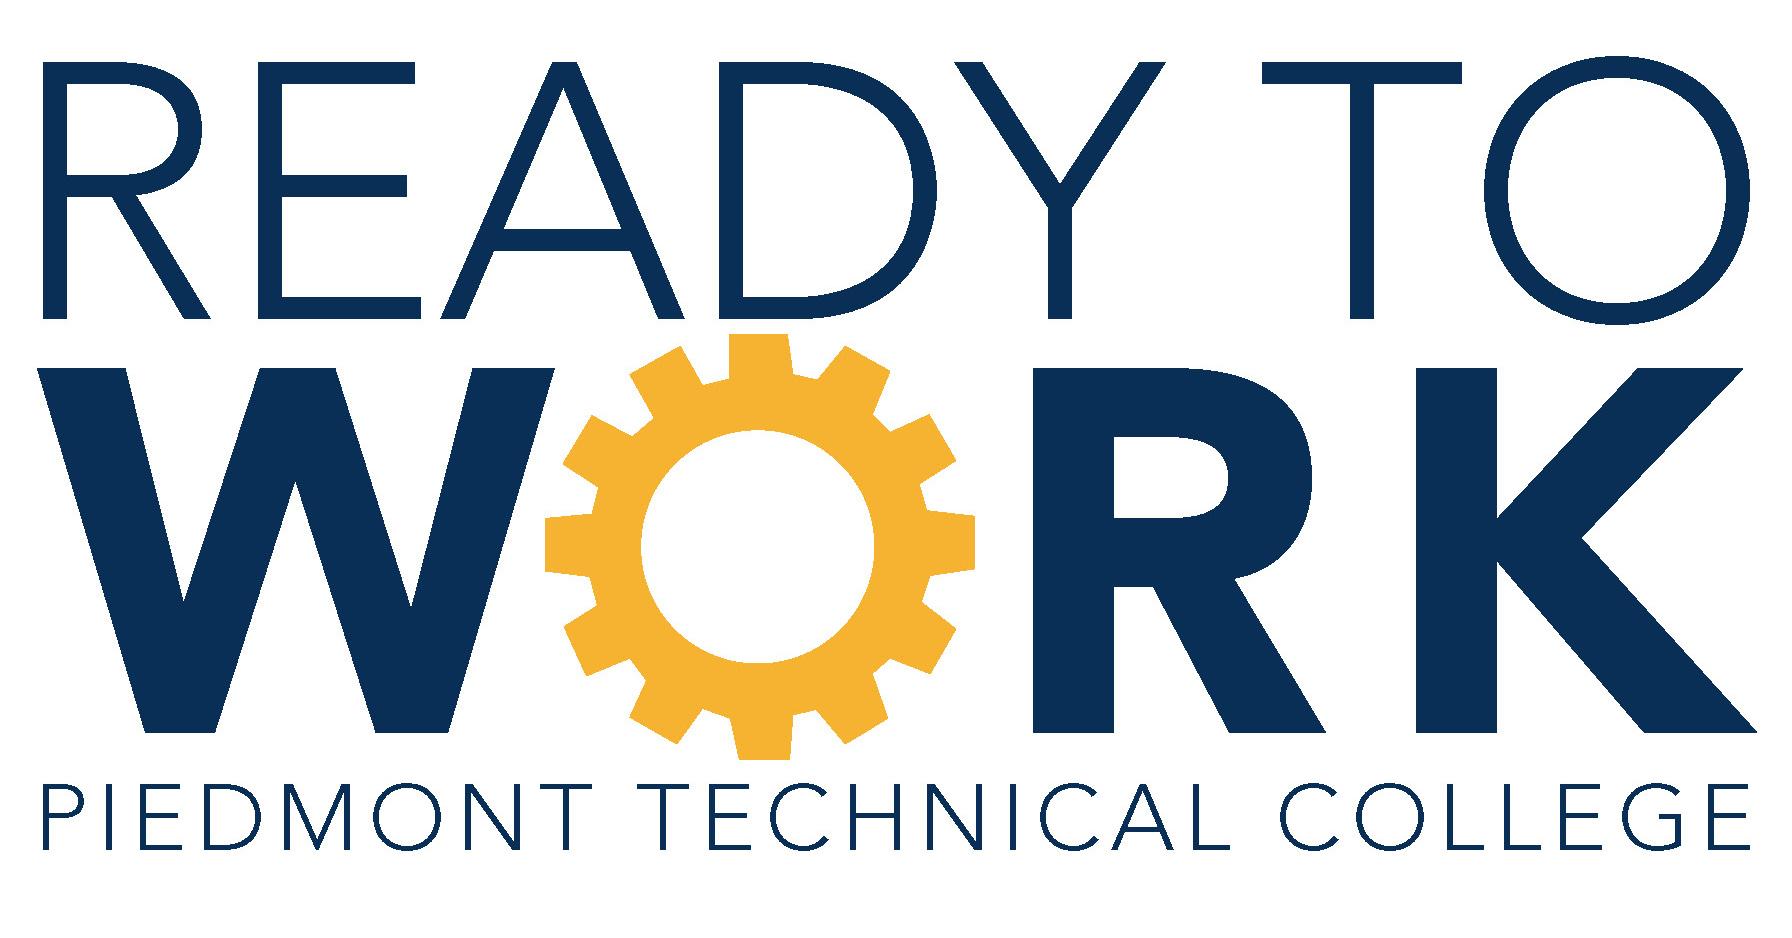 Ready_to_Work_Logo.jpg